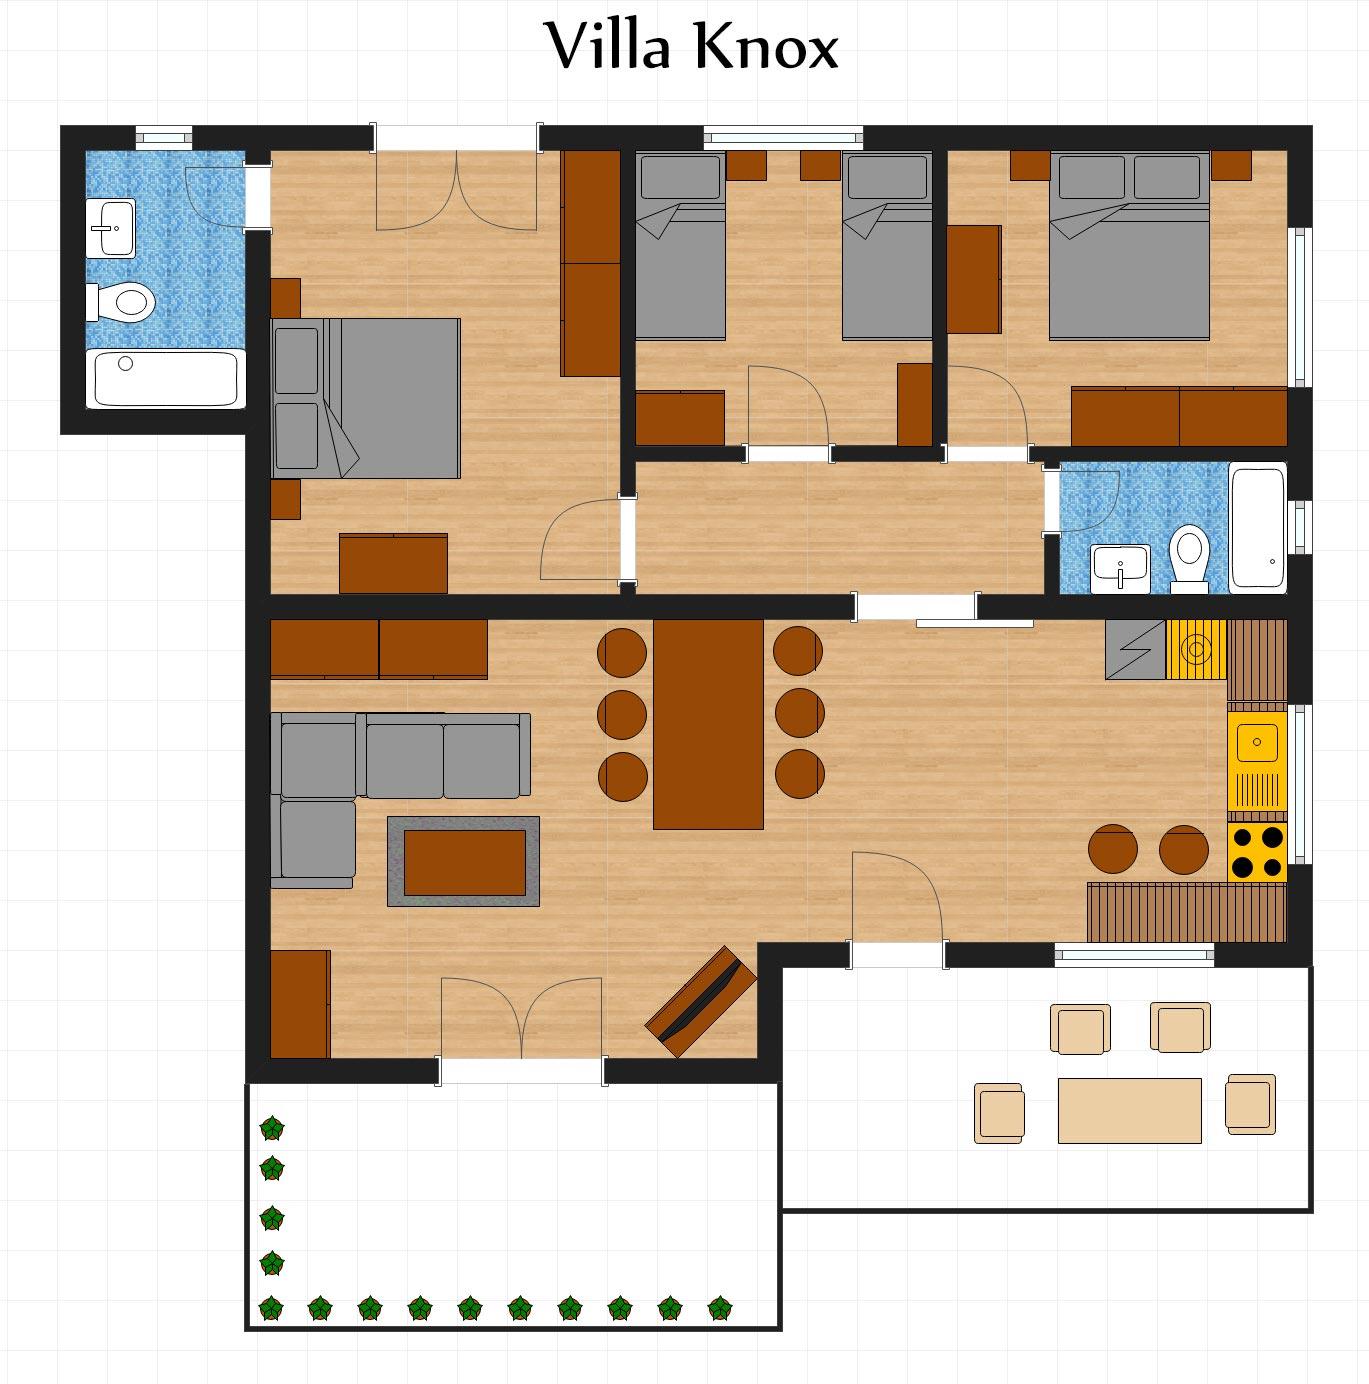 Floor Plan - Villa Knox